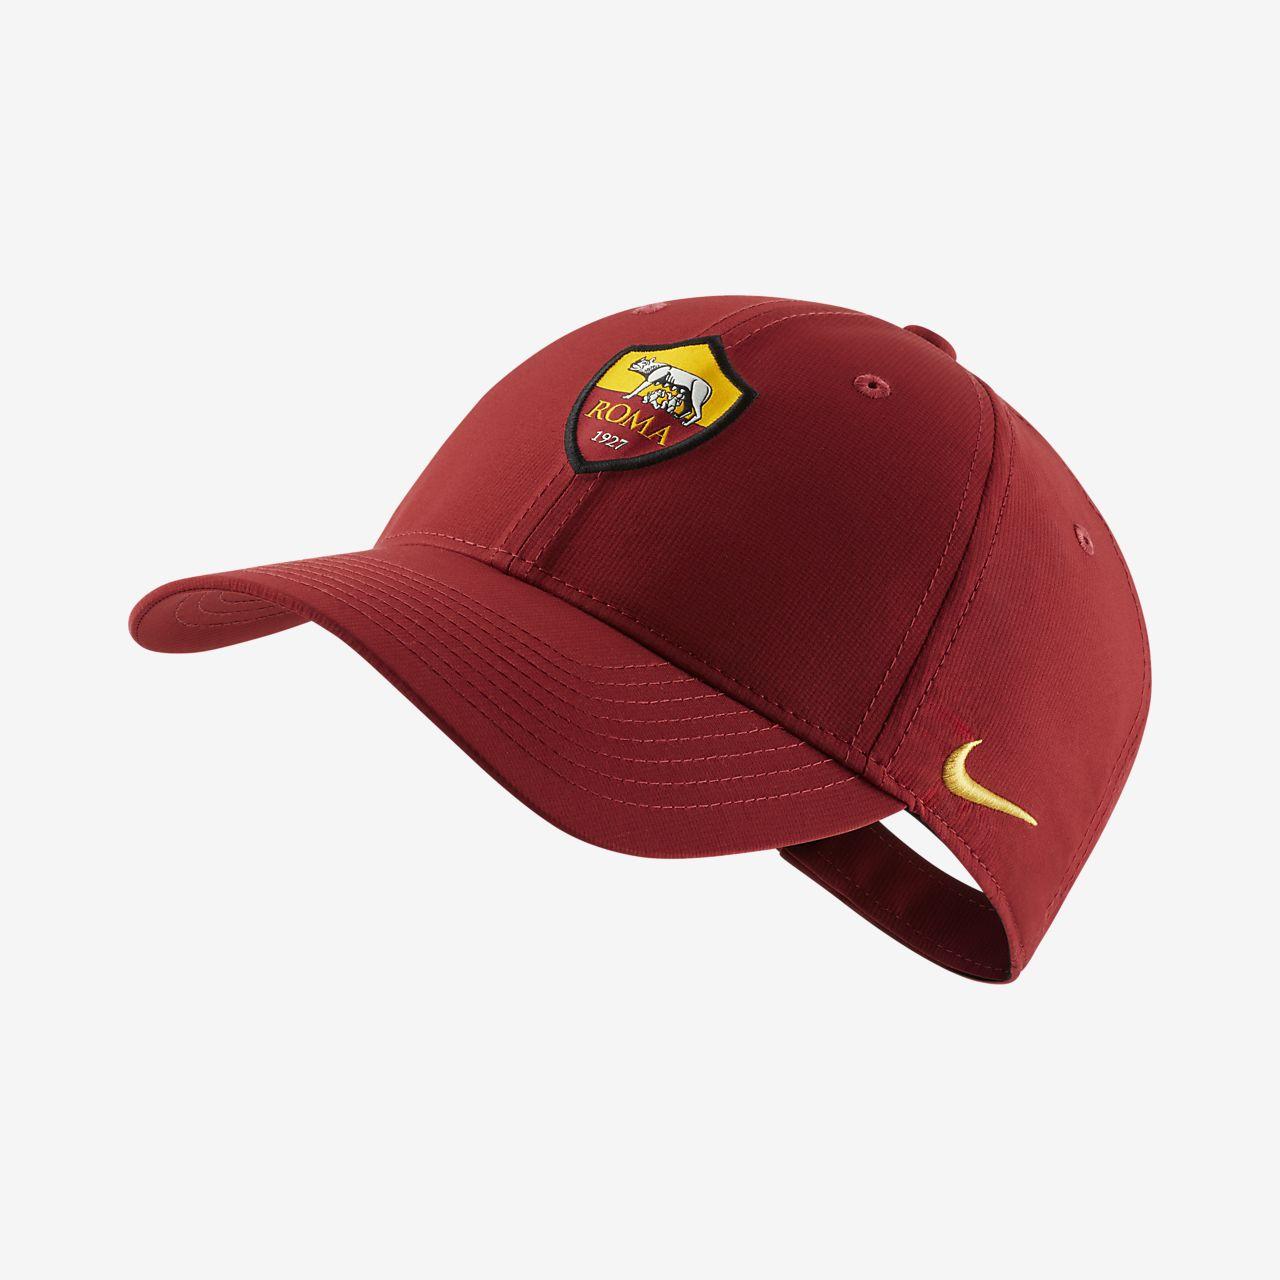 Nike Dri-FIT A.S. Roma Legacy91 justerbar caps